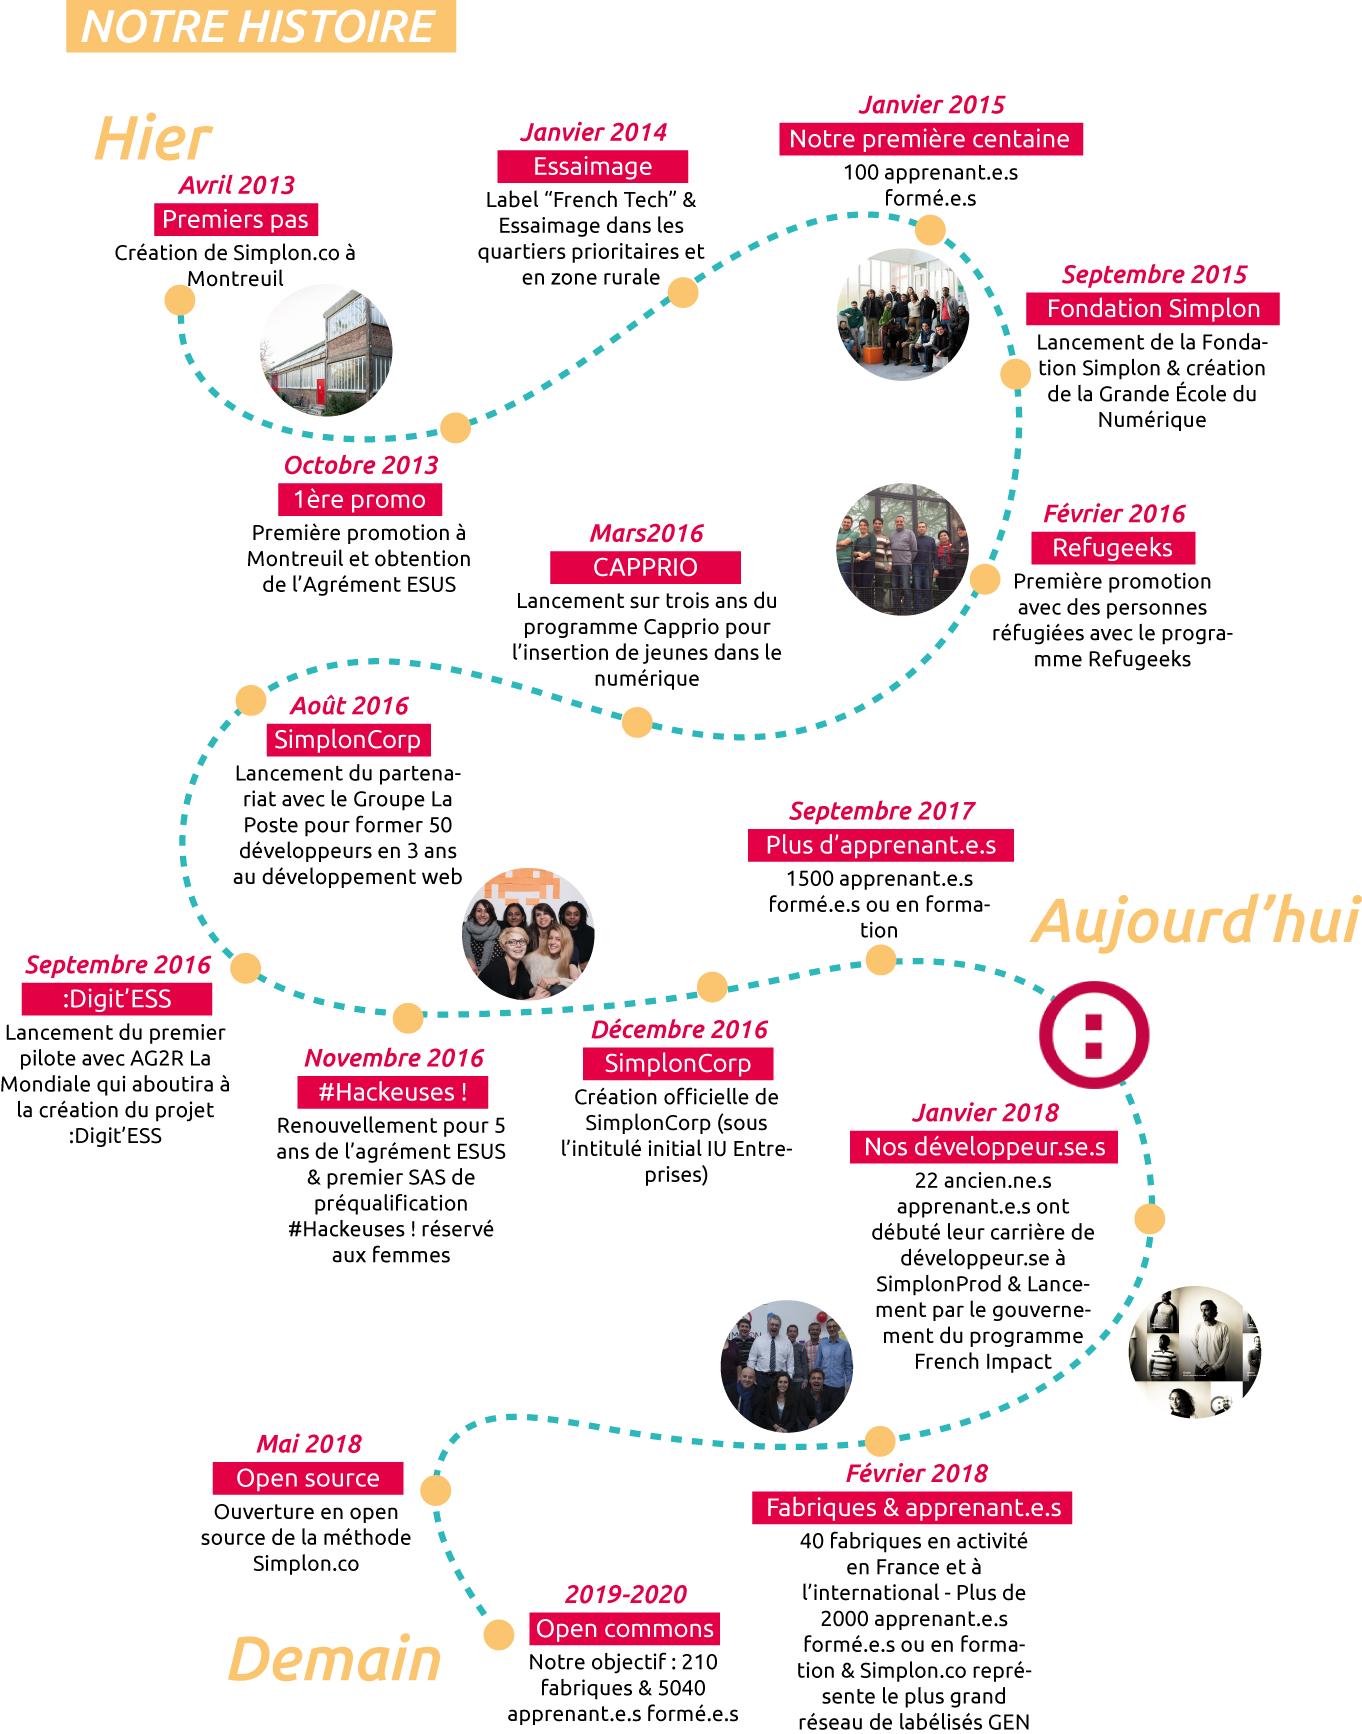 Histoire de Simplon